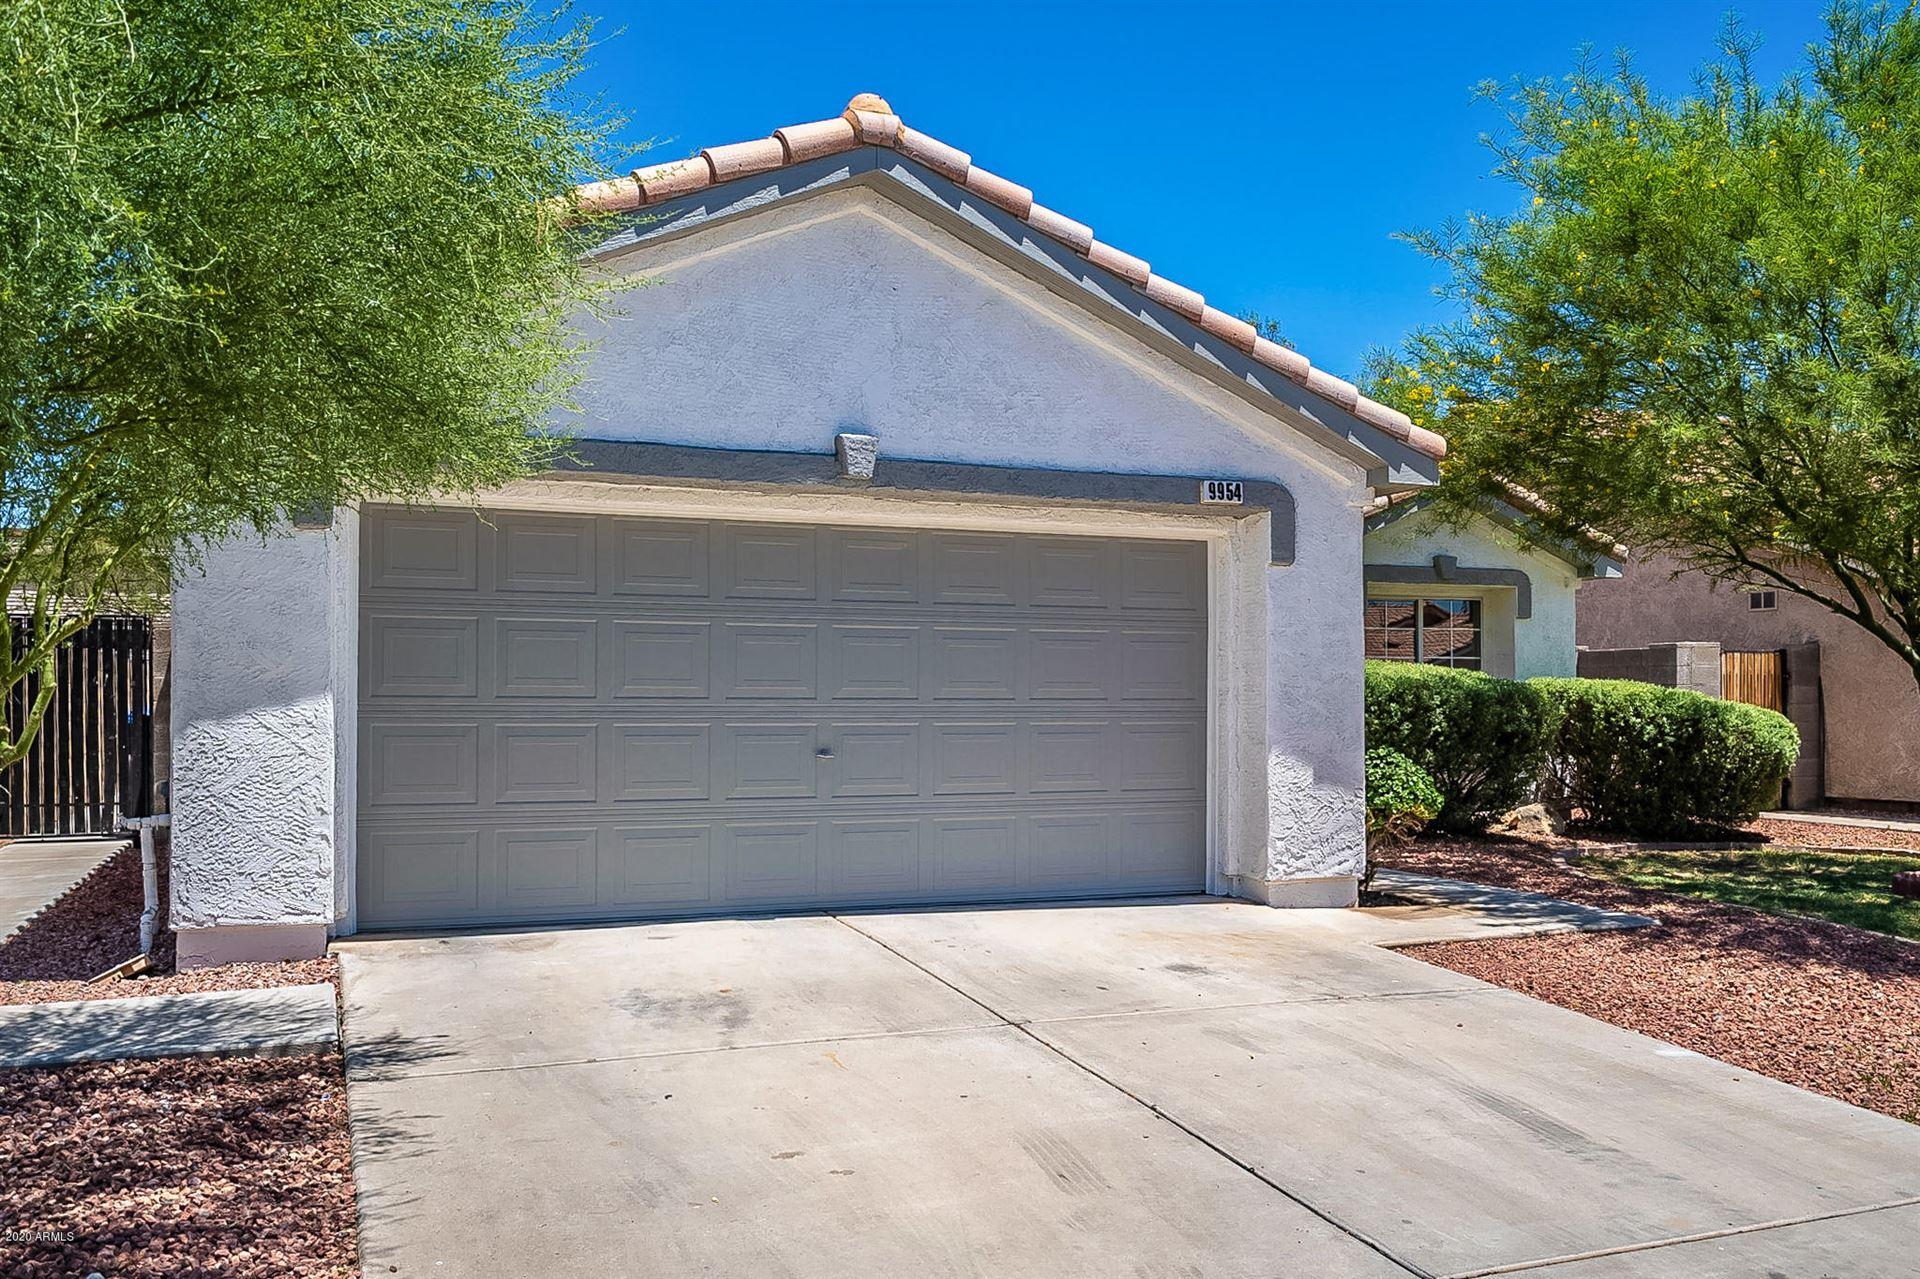 9954 W MACKENZIE Drive, Phoenix, AZ 85037 - MLS#: 6089457